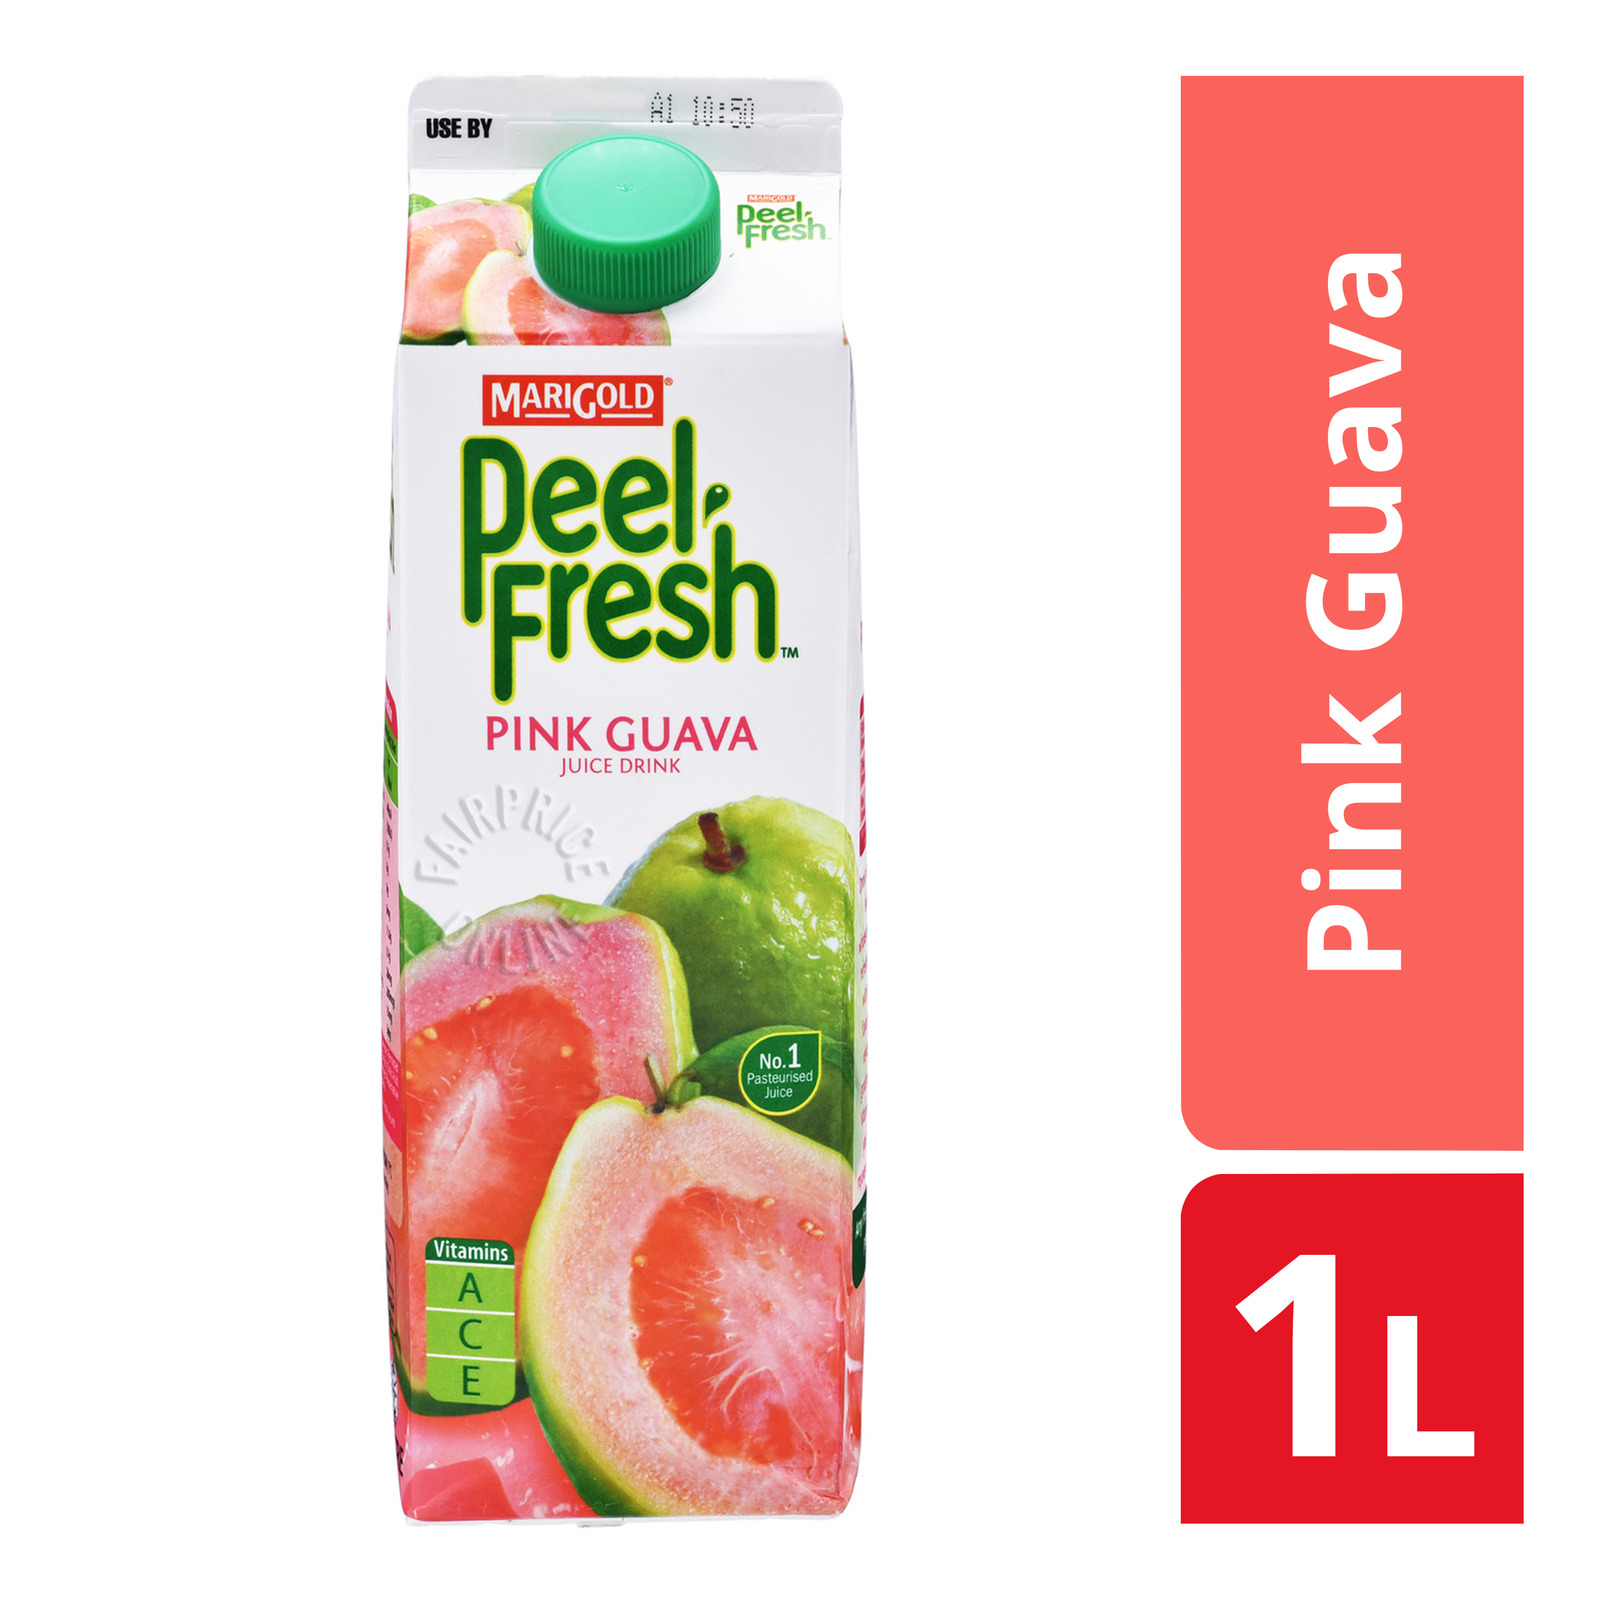 Marigold Peel Fresh Juice - Pink Guava